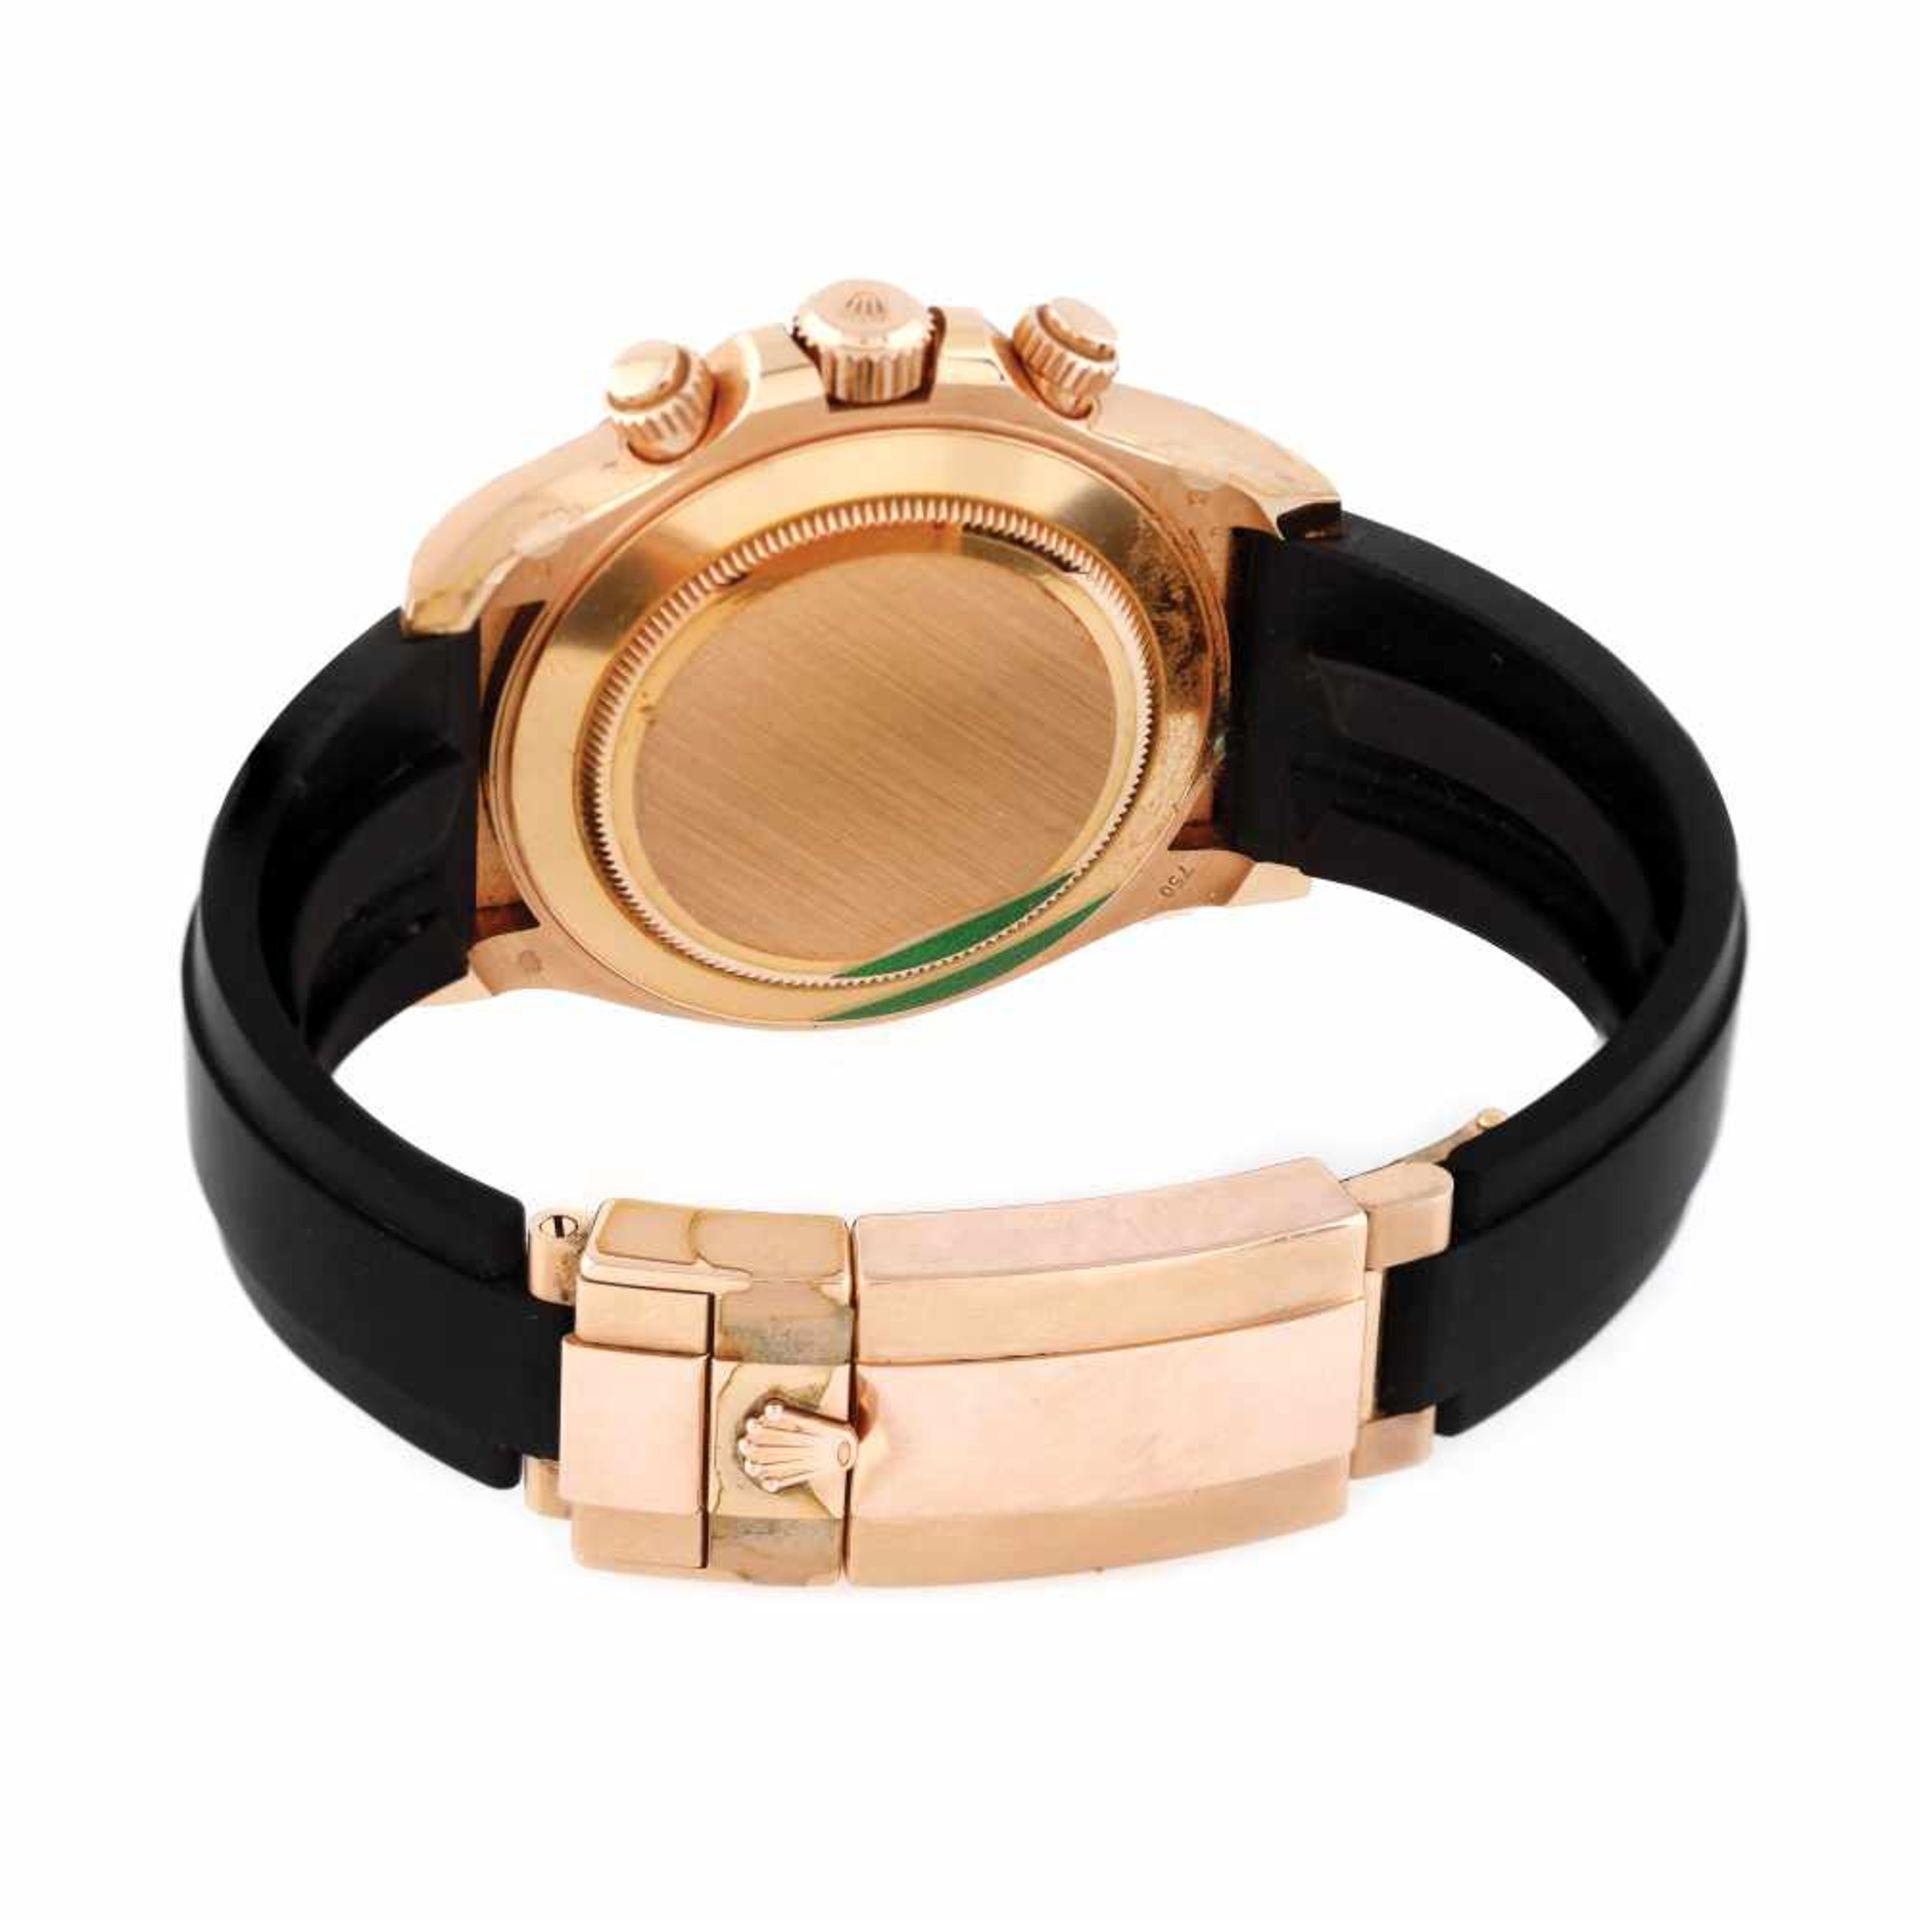 Rolex Daytona wristwatch, rose gold, unisex, original box - Bild 2 aus 3